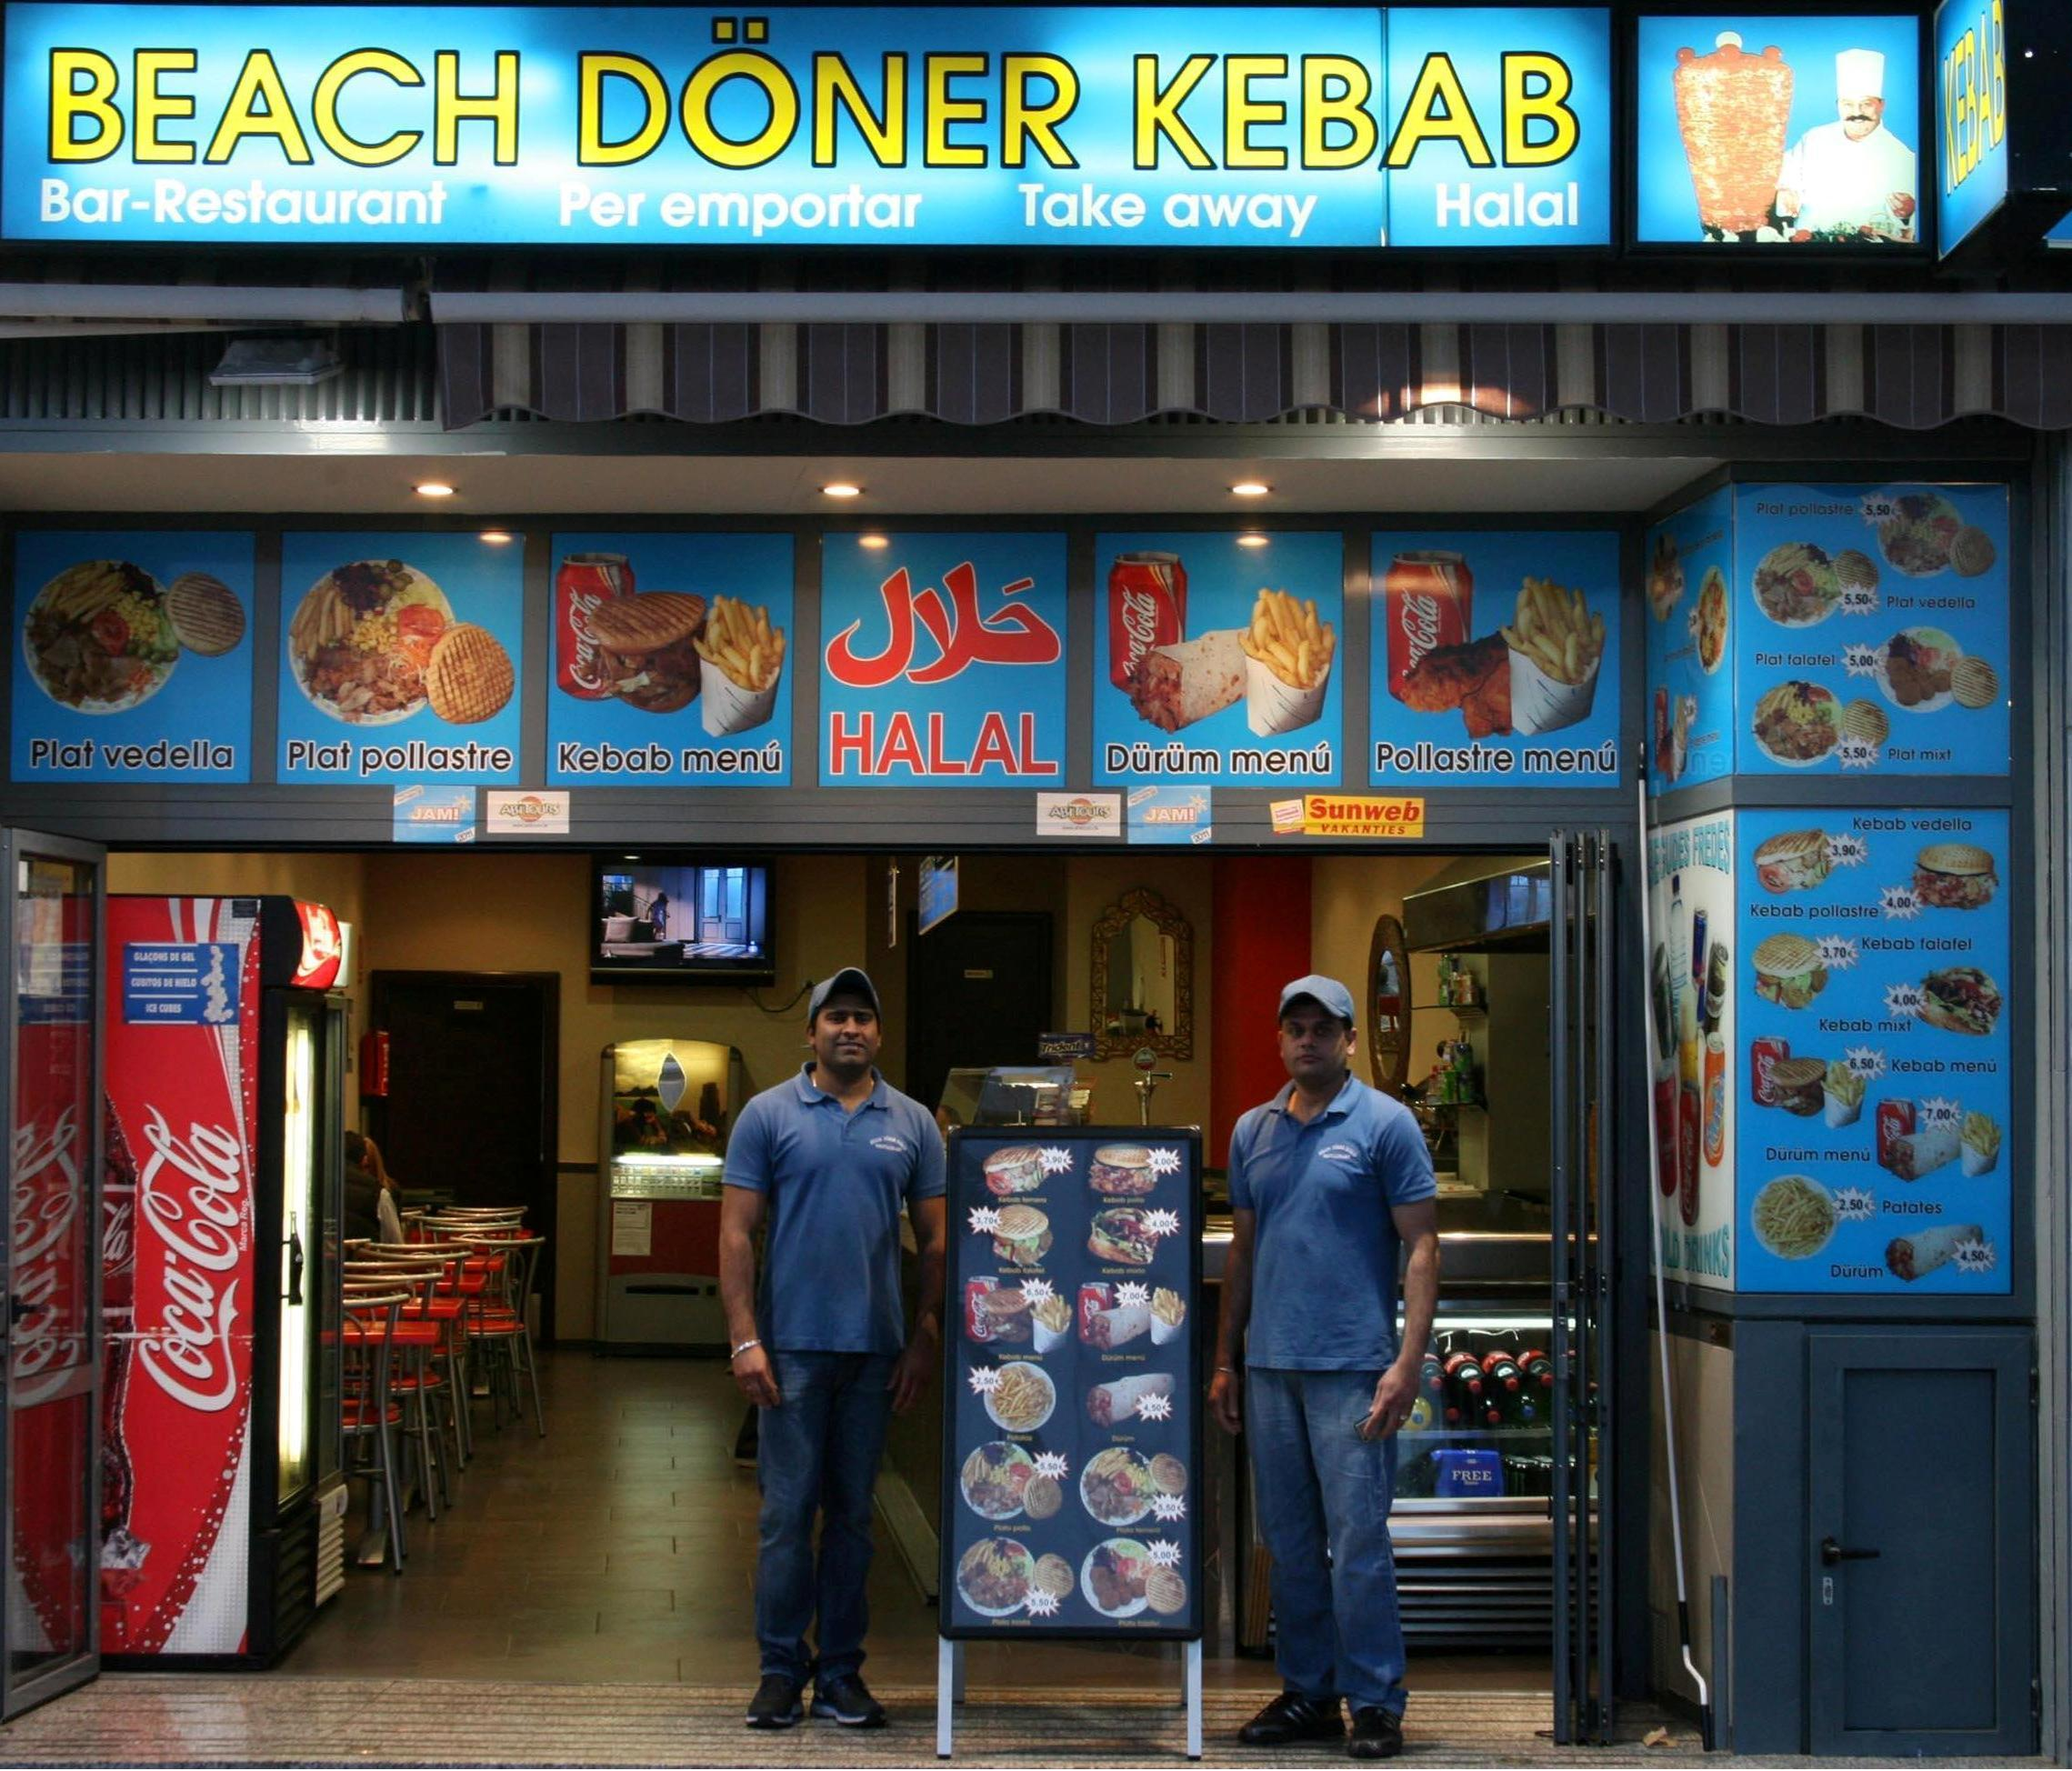 HORARIO  BEACH DNER KEBAB LLORET